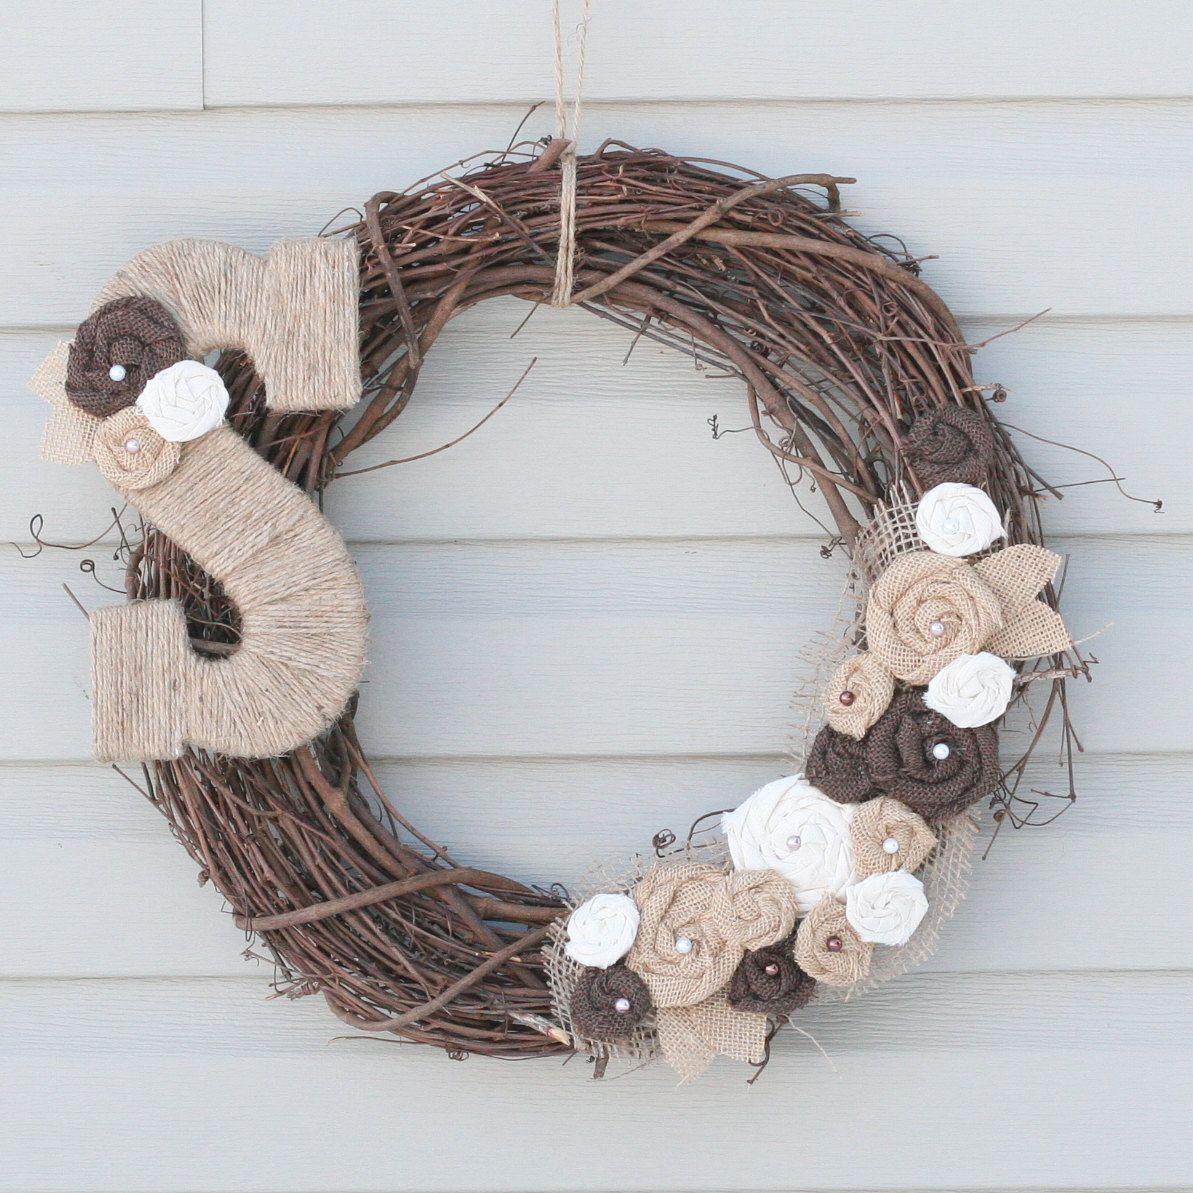 Burlap wreath with pearls and jute monogram letter diy